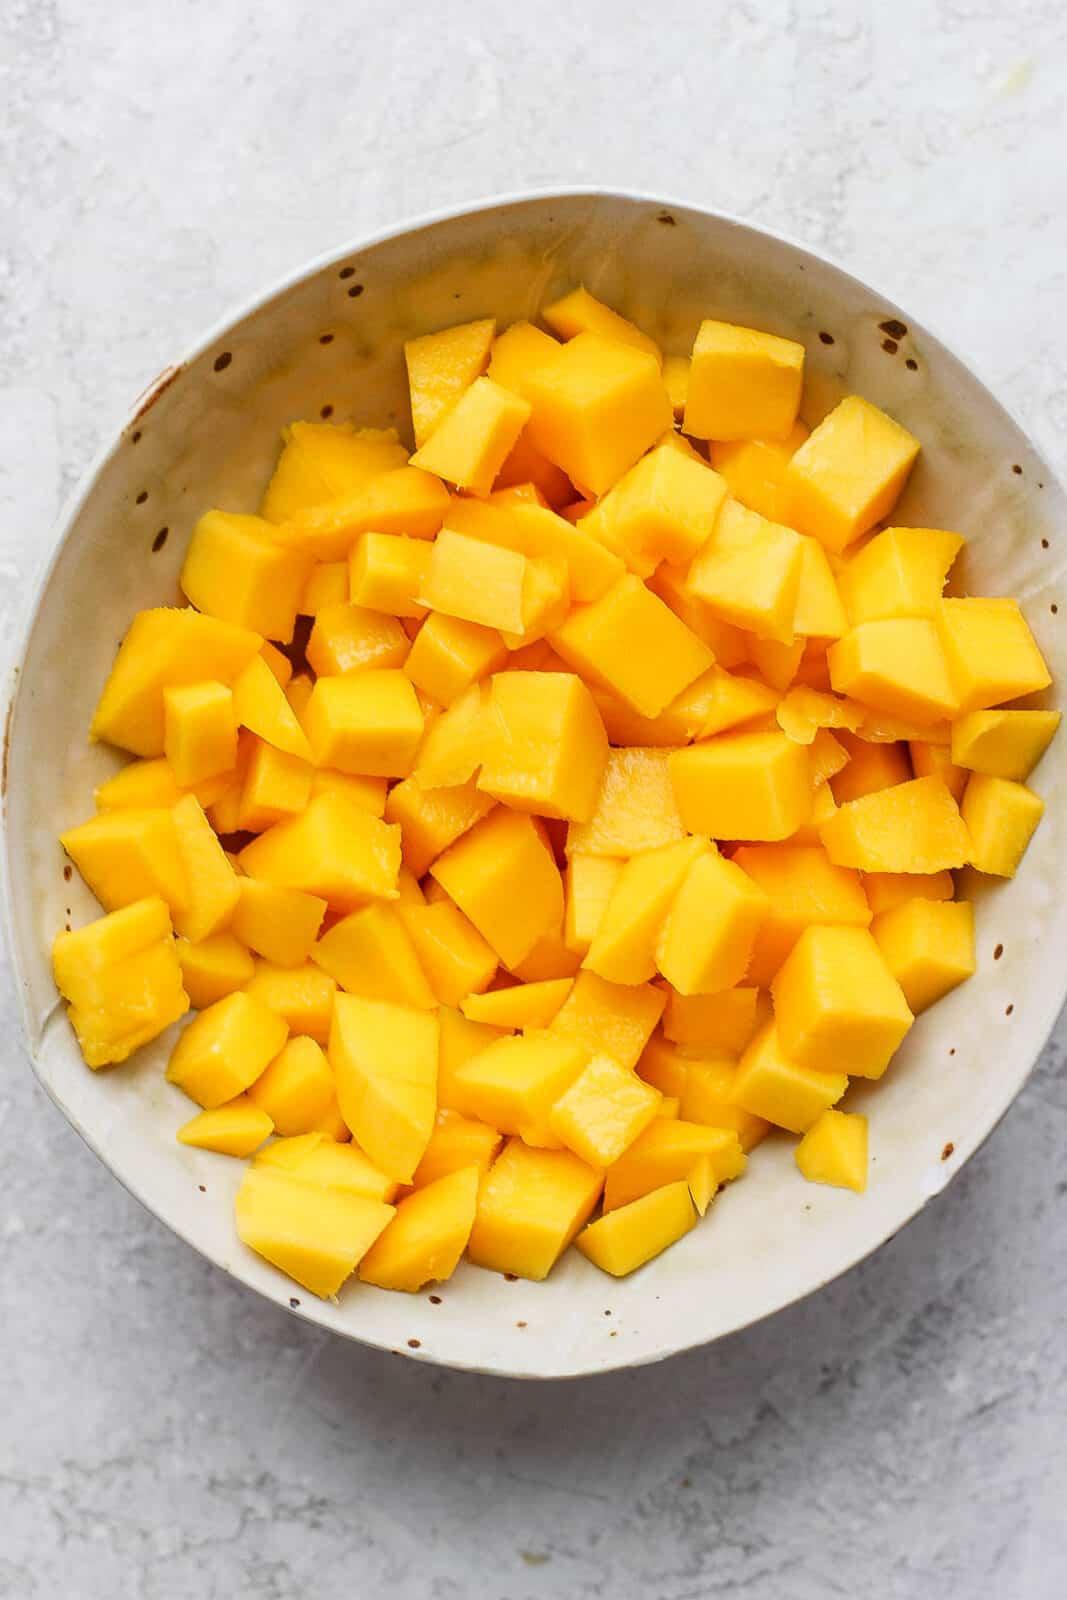 A bowl of diced mango.